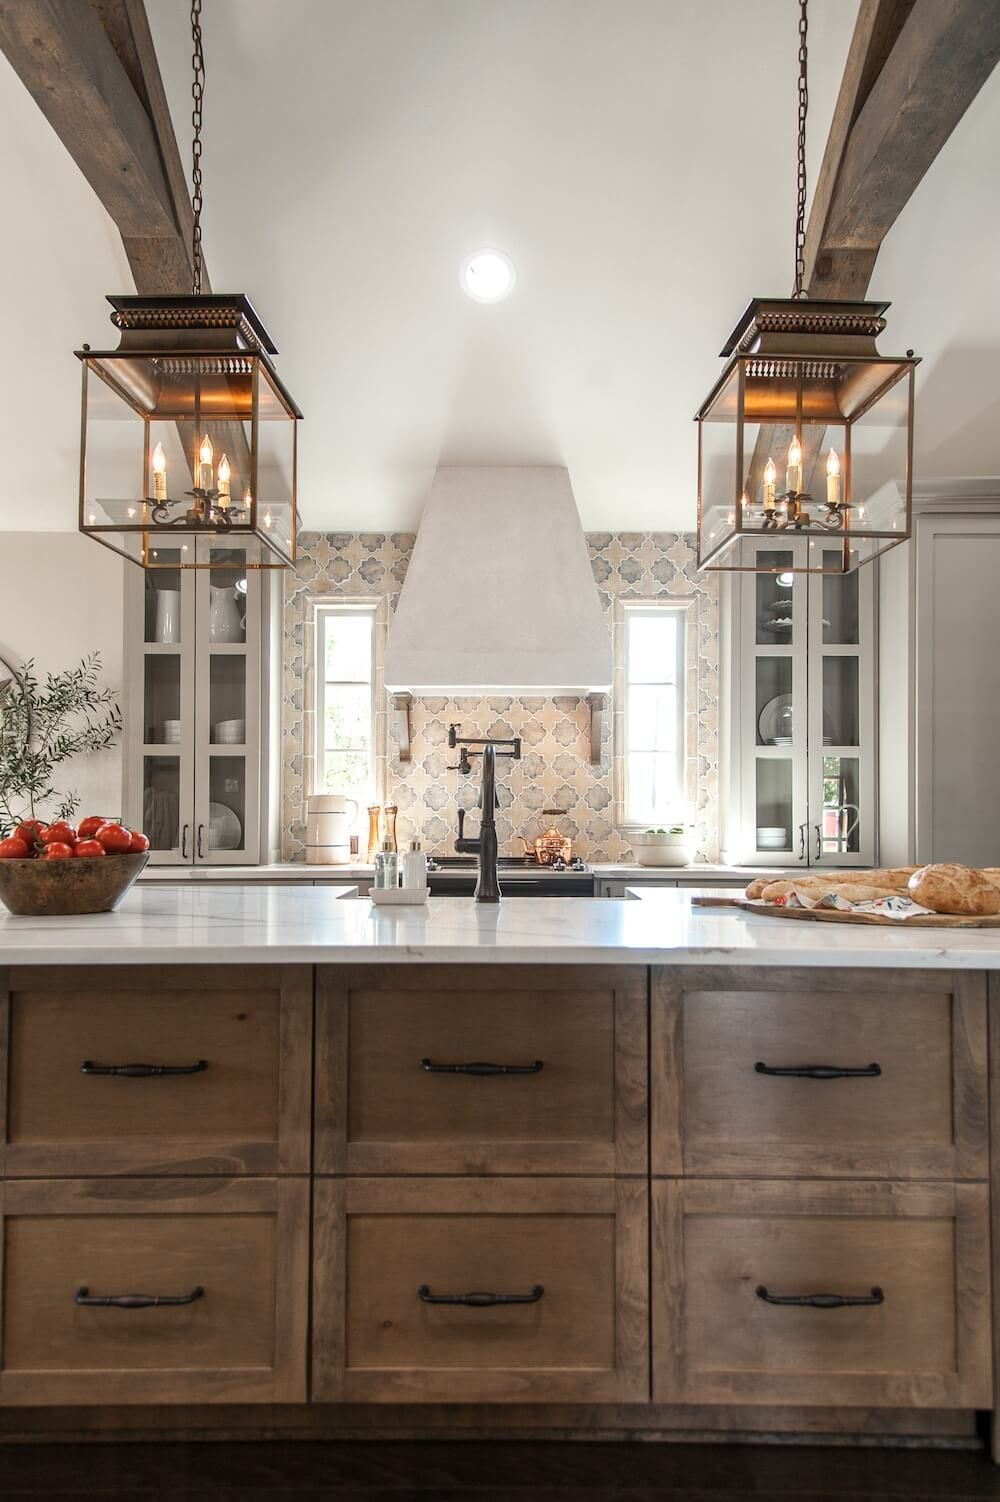 35 Farmhouse Kitchen Ideas to Create a Warm and